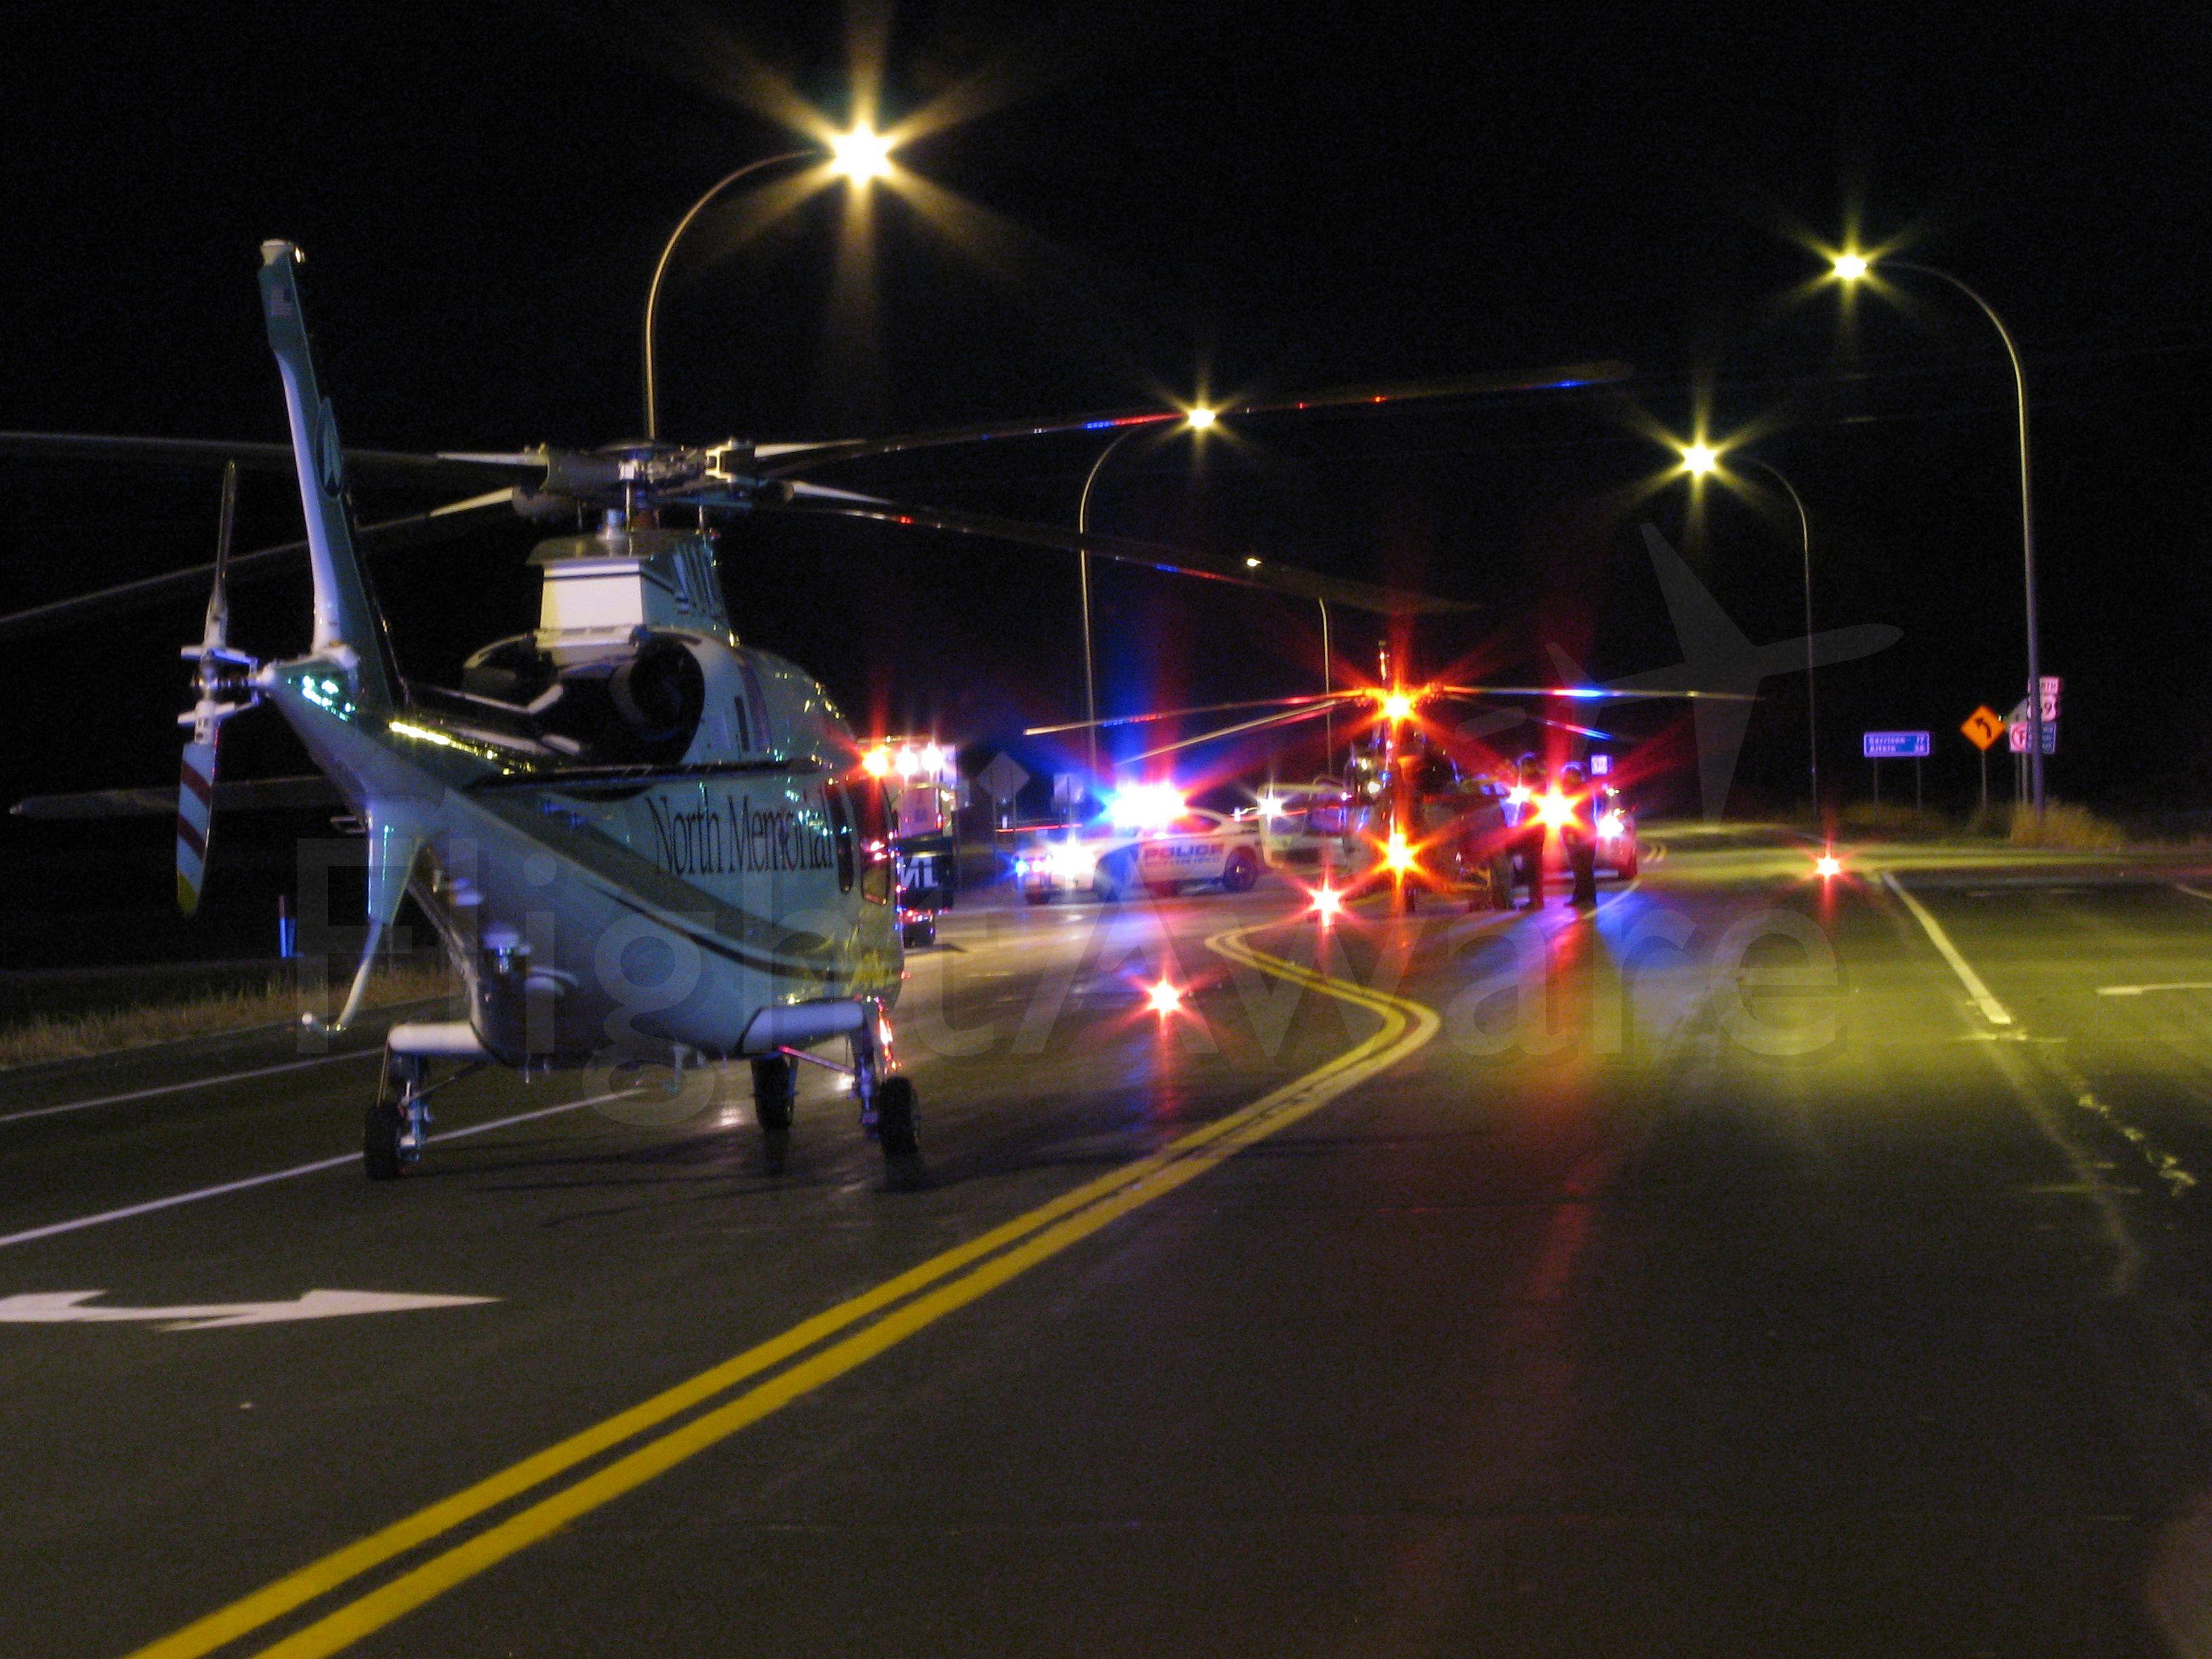 SABCA A-109 (N10NM) - Two Air Care ships at a crash scene in Minnesota